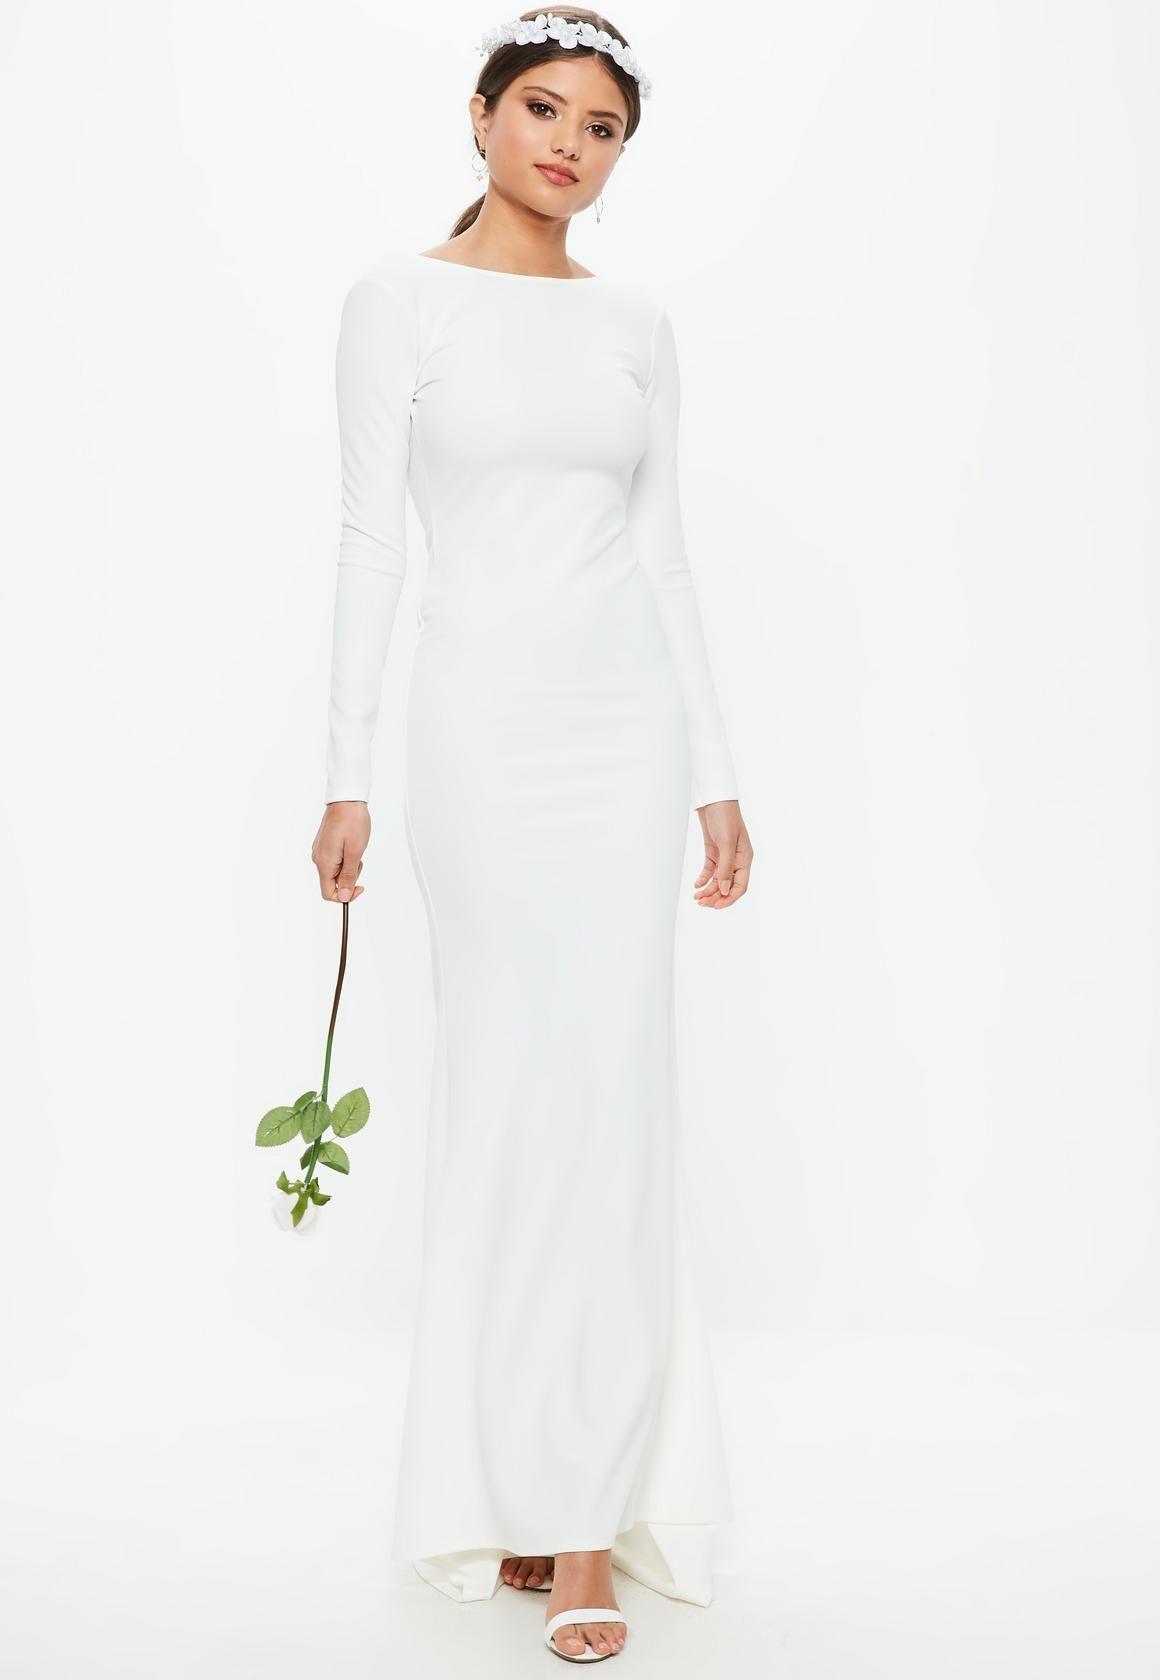 Mature bride wedding dresses  Missguided  Bridal White Long Sleeve Open Back Fishtail Dress